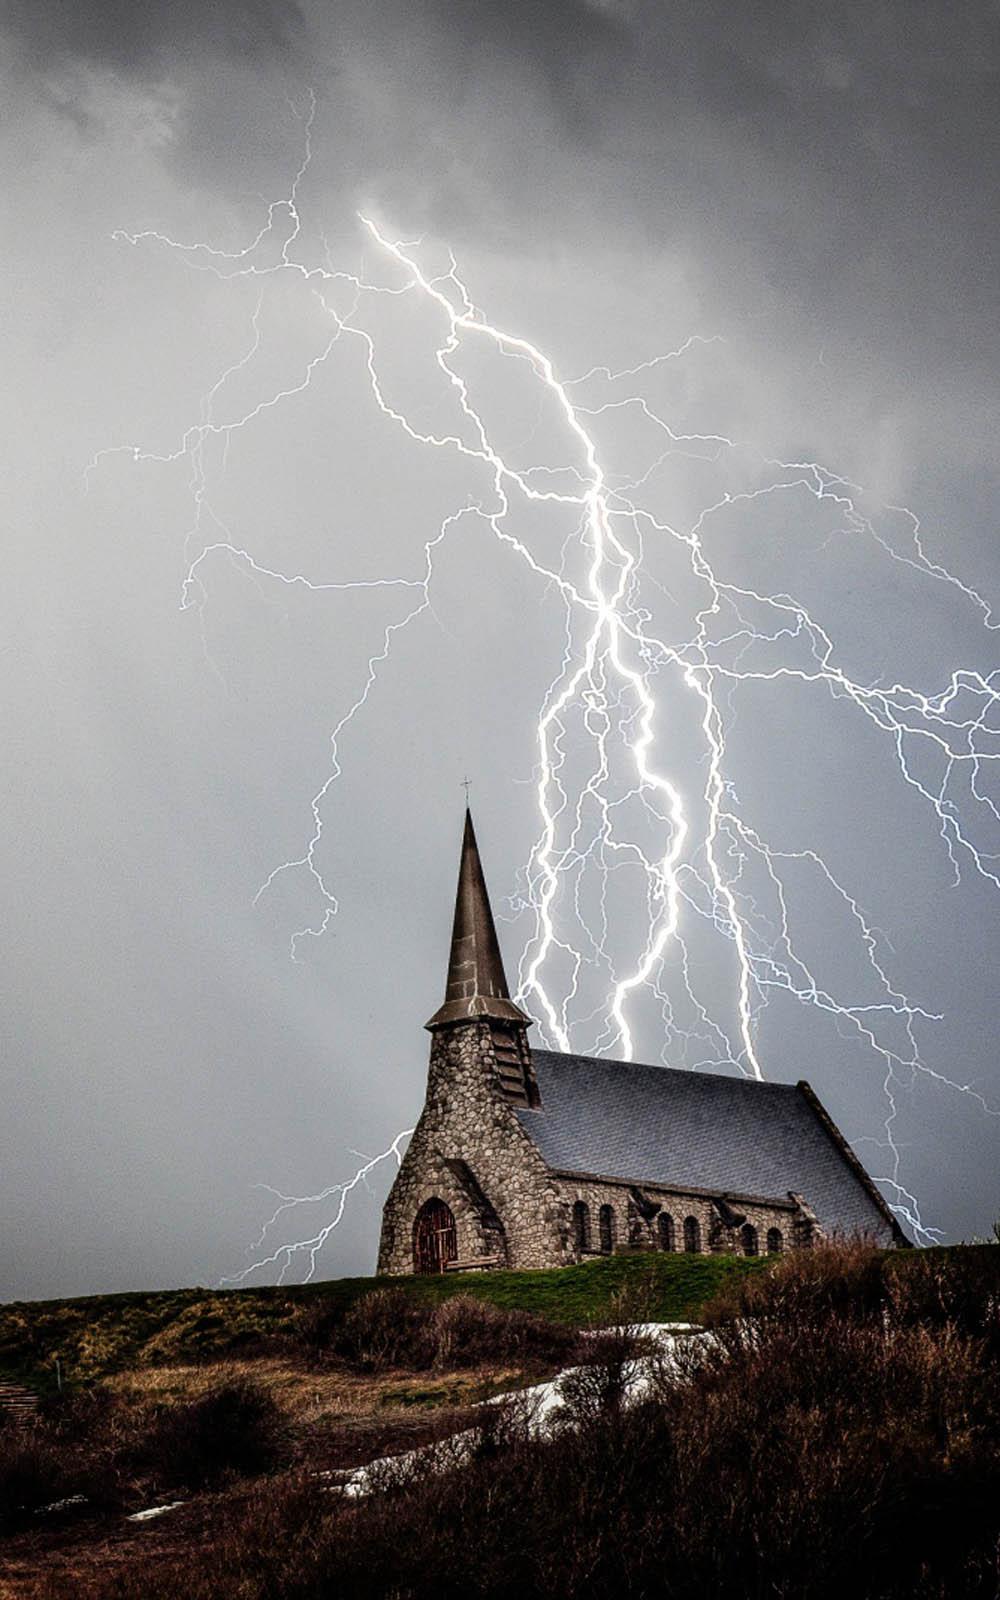 Download church storm lightning free pure 4k ultra hd mobile wallpaper - Lightning wallpaper 4k ...